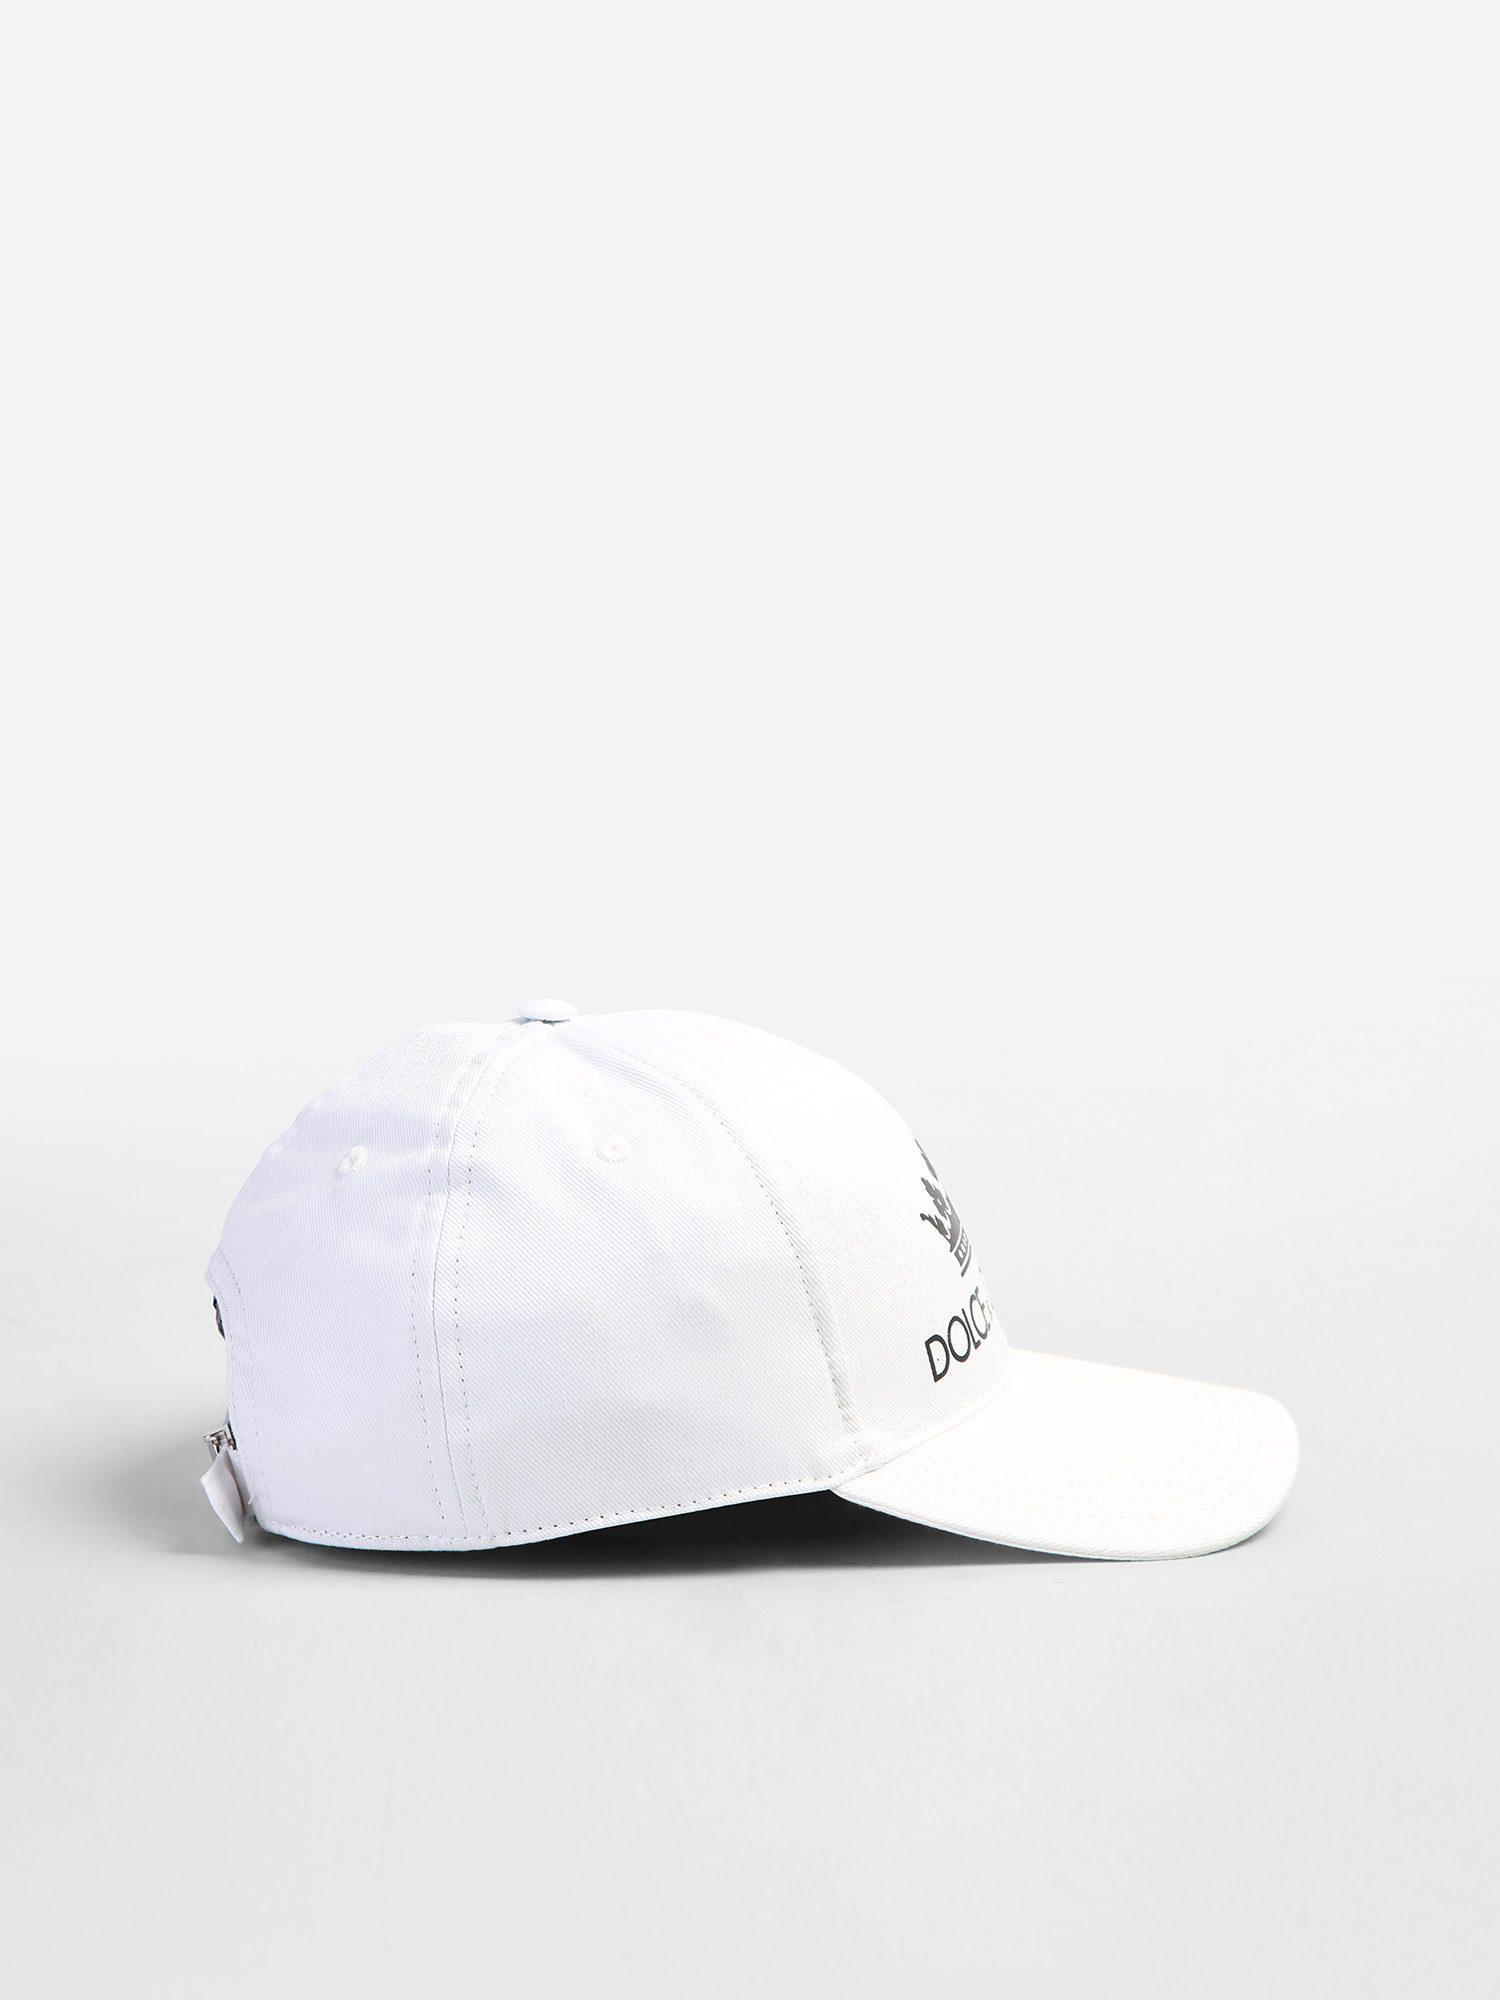 5e7e5ffb31b Lyst - Dolce   Gabbana Printed Baseball Hat in White for Men - Save 5%